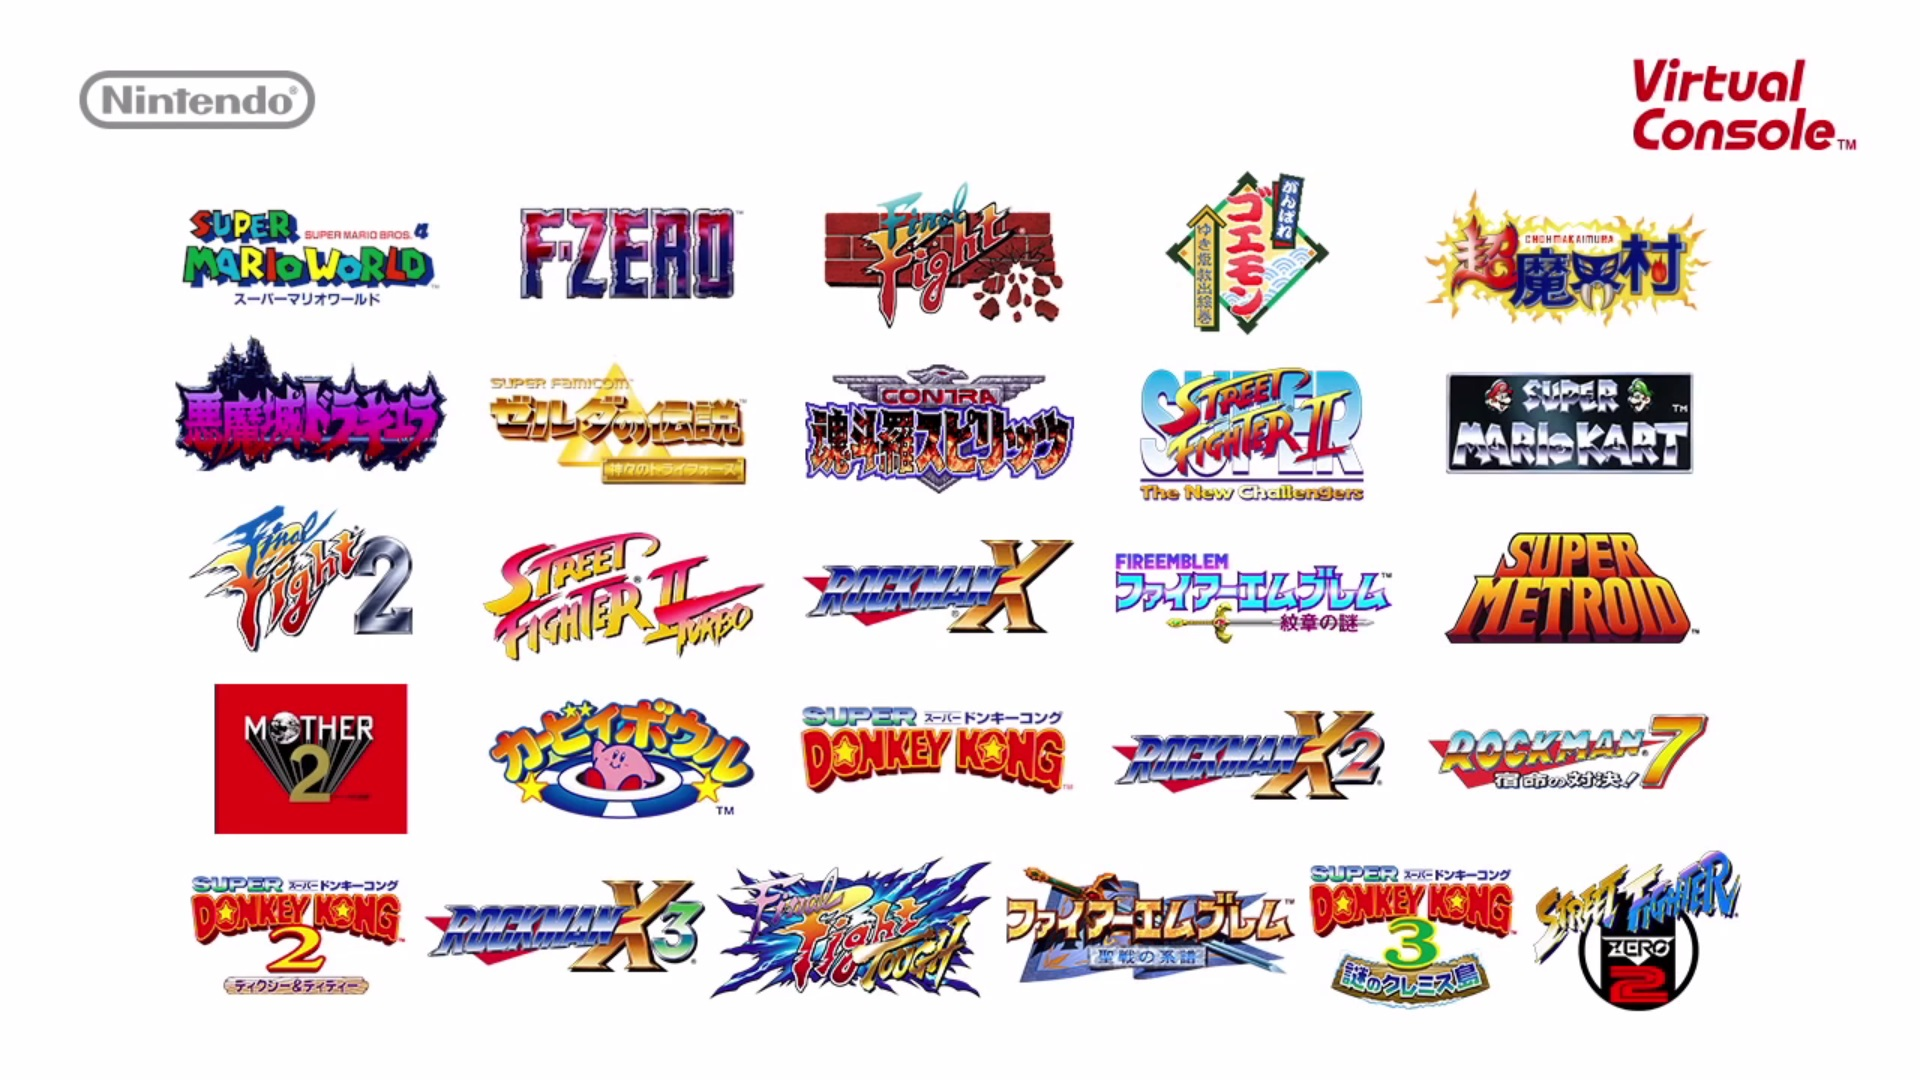 Japan 3DS Virtual Console Lineup